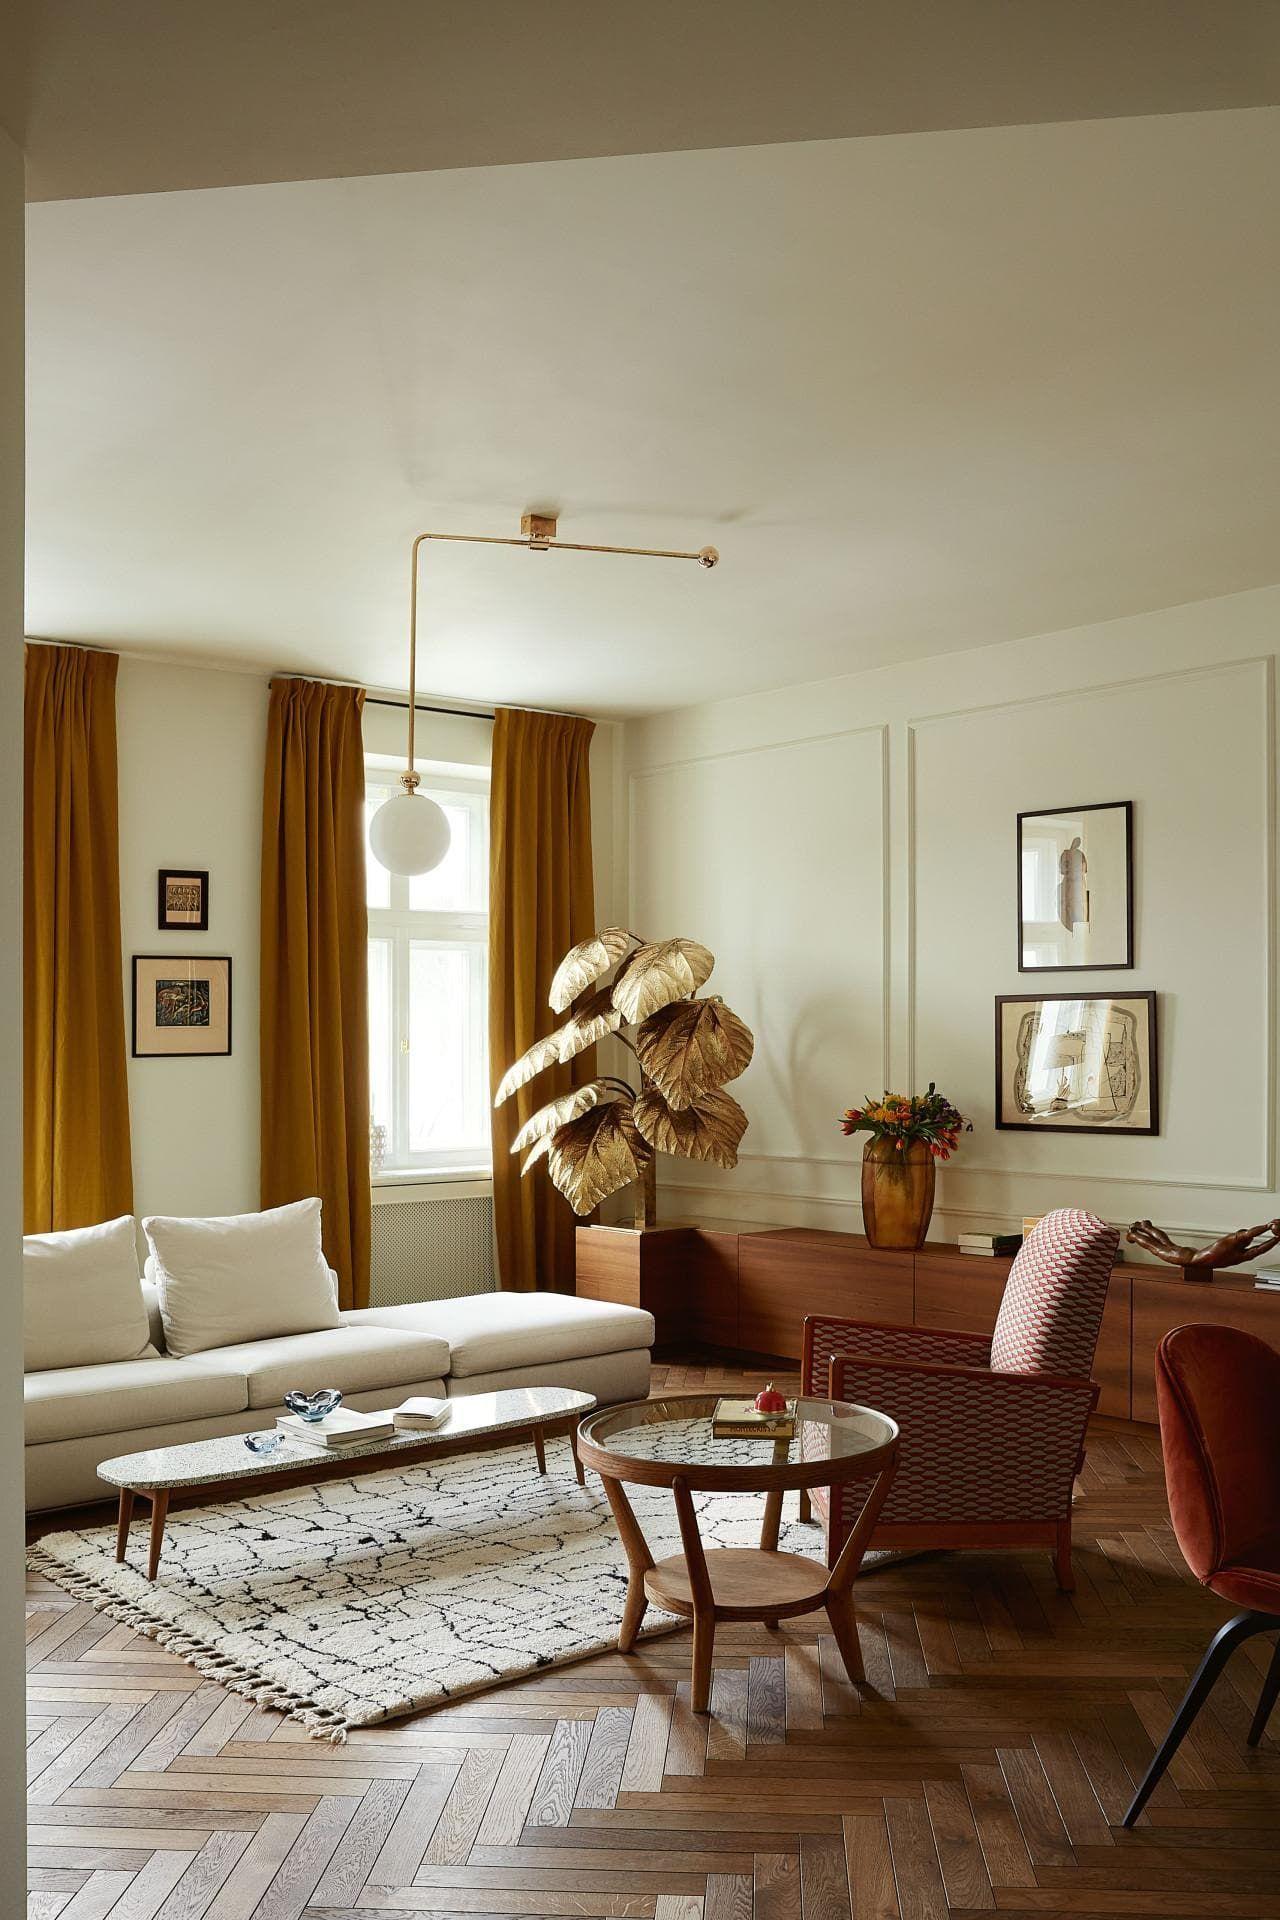 Prewar Modern House Tour With Elegant Parisian Touches Living